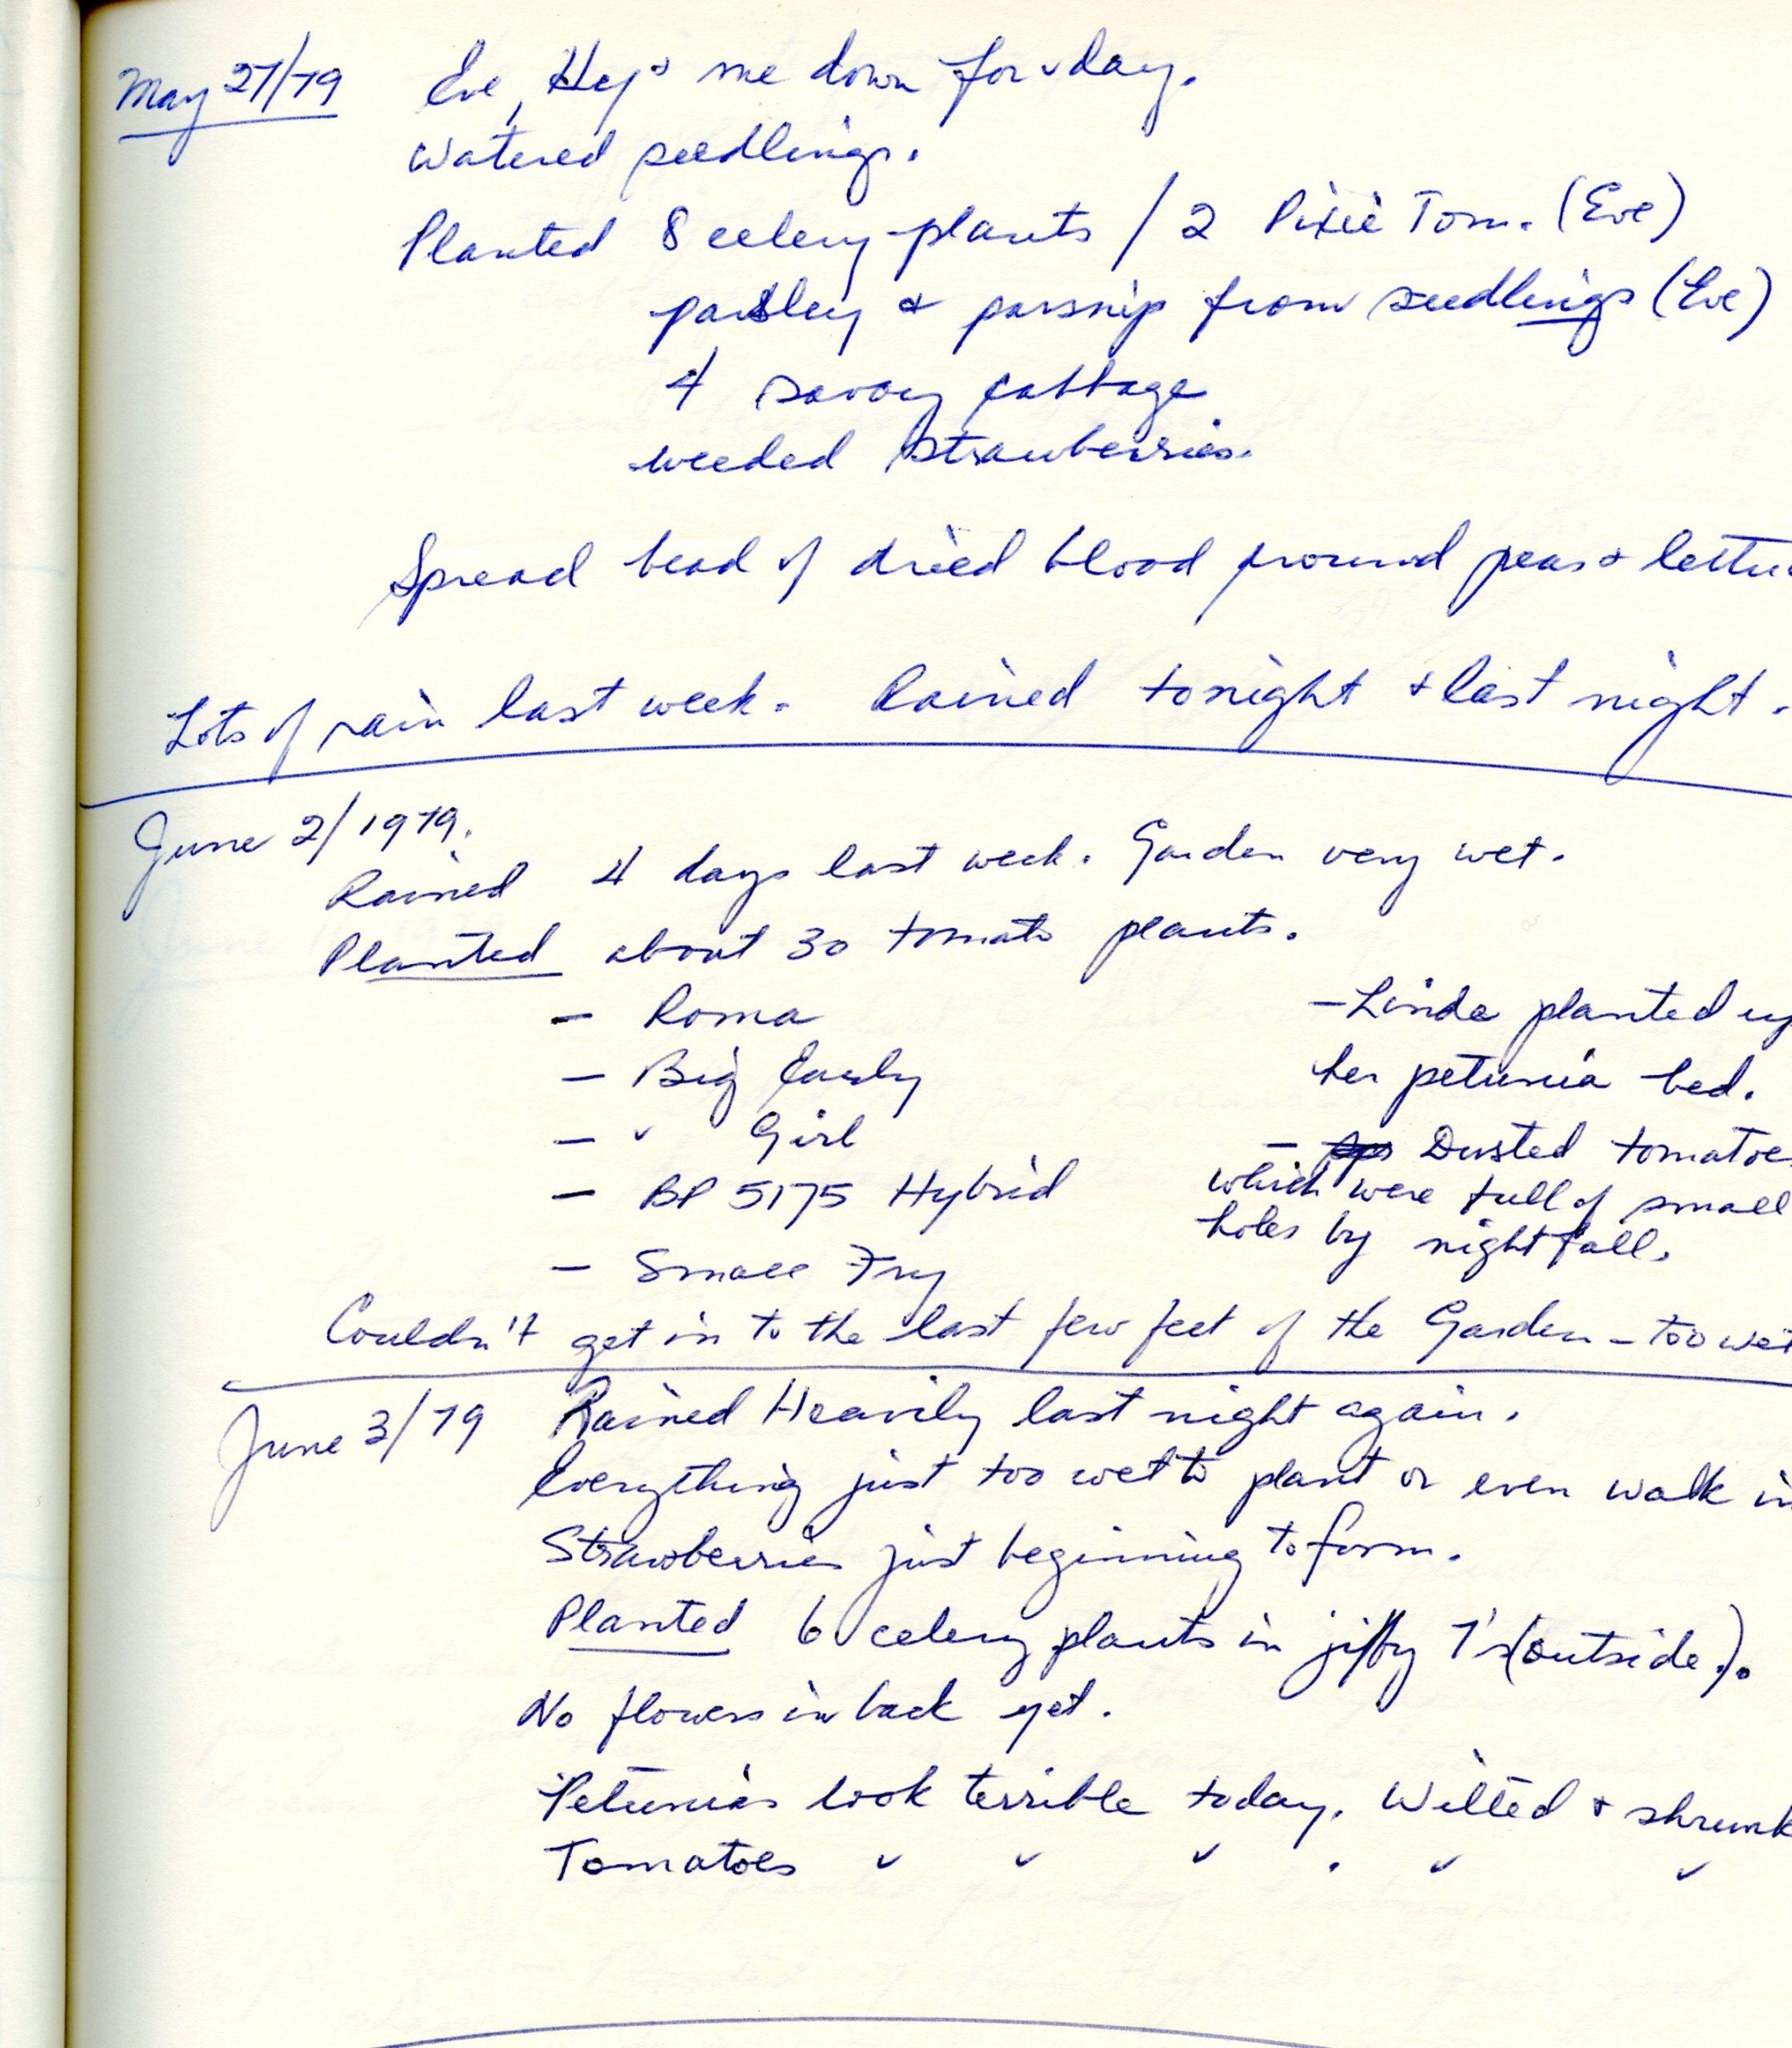 Handwritten page from a gardening journal